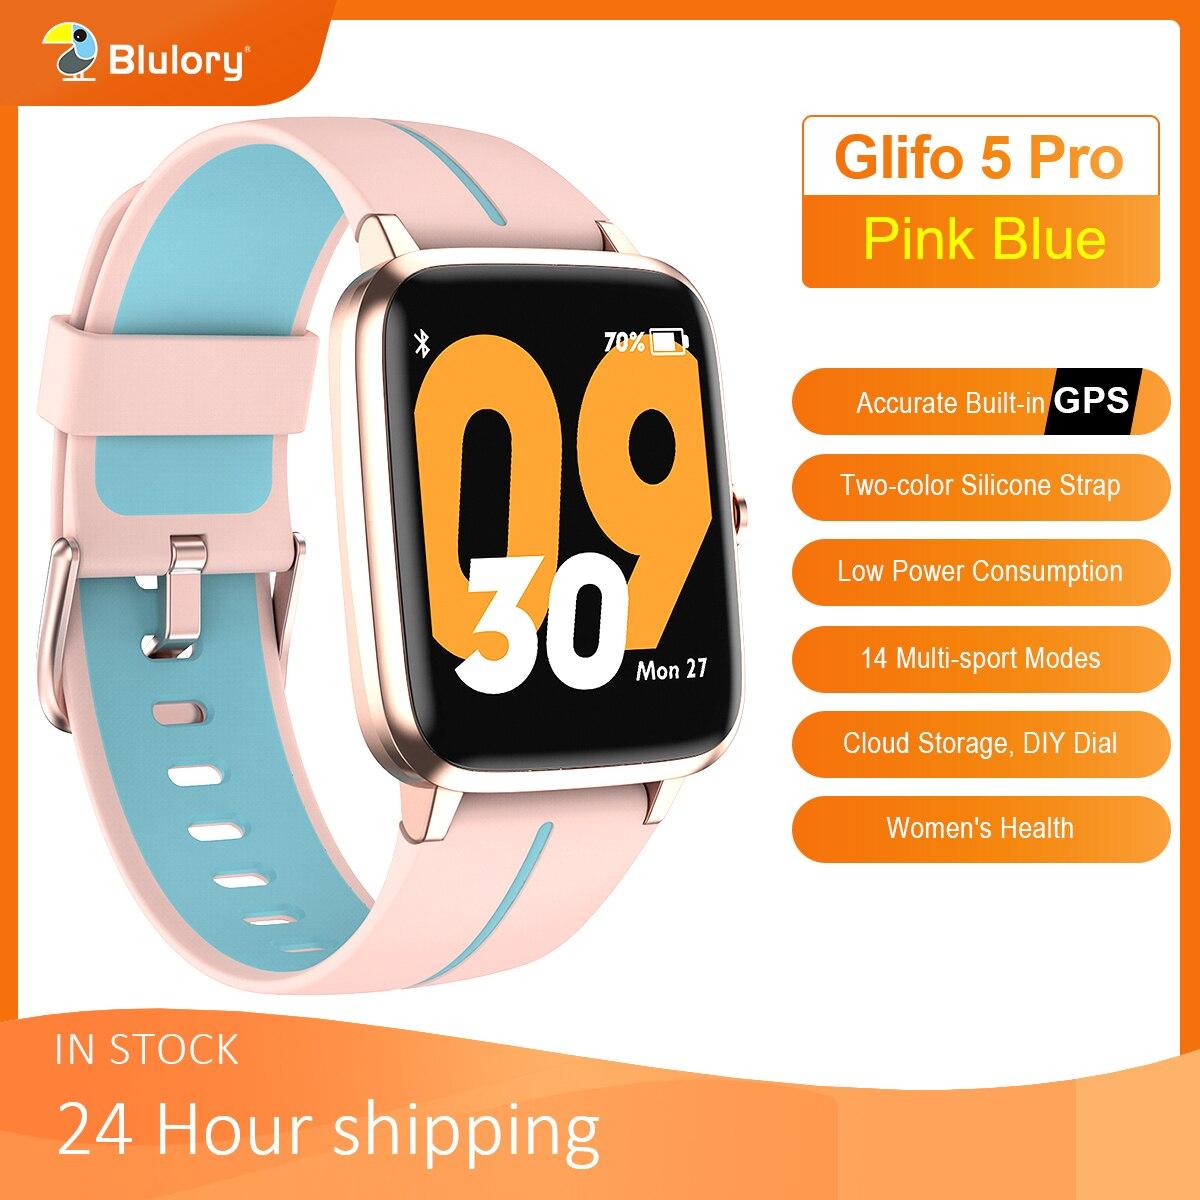 Смарт-часы Blulory Glifo 5 Pro, GPS, Bluetooth, пульсометр